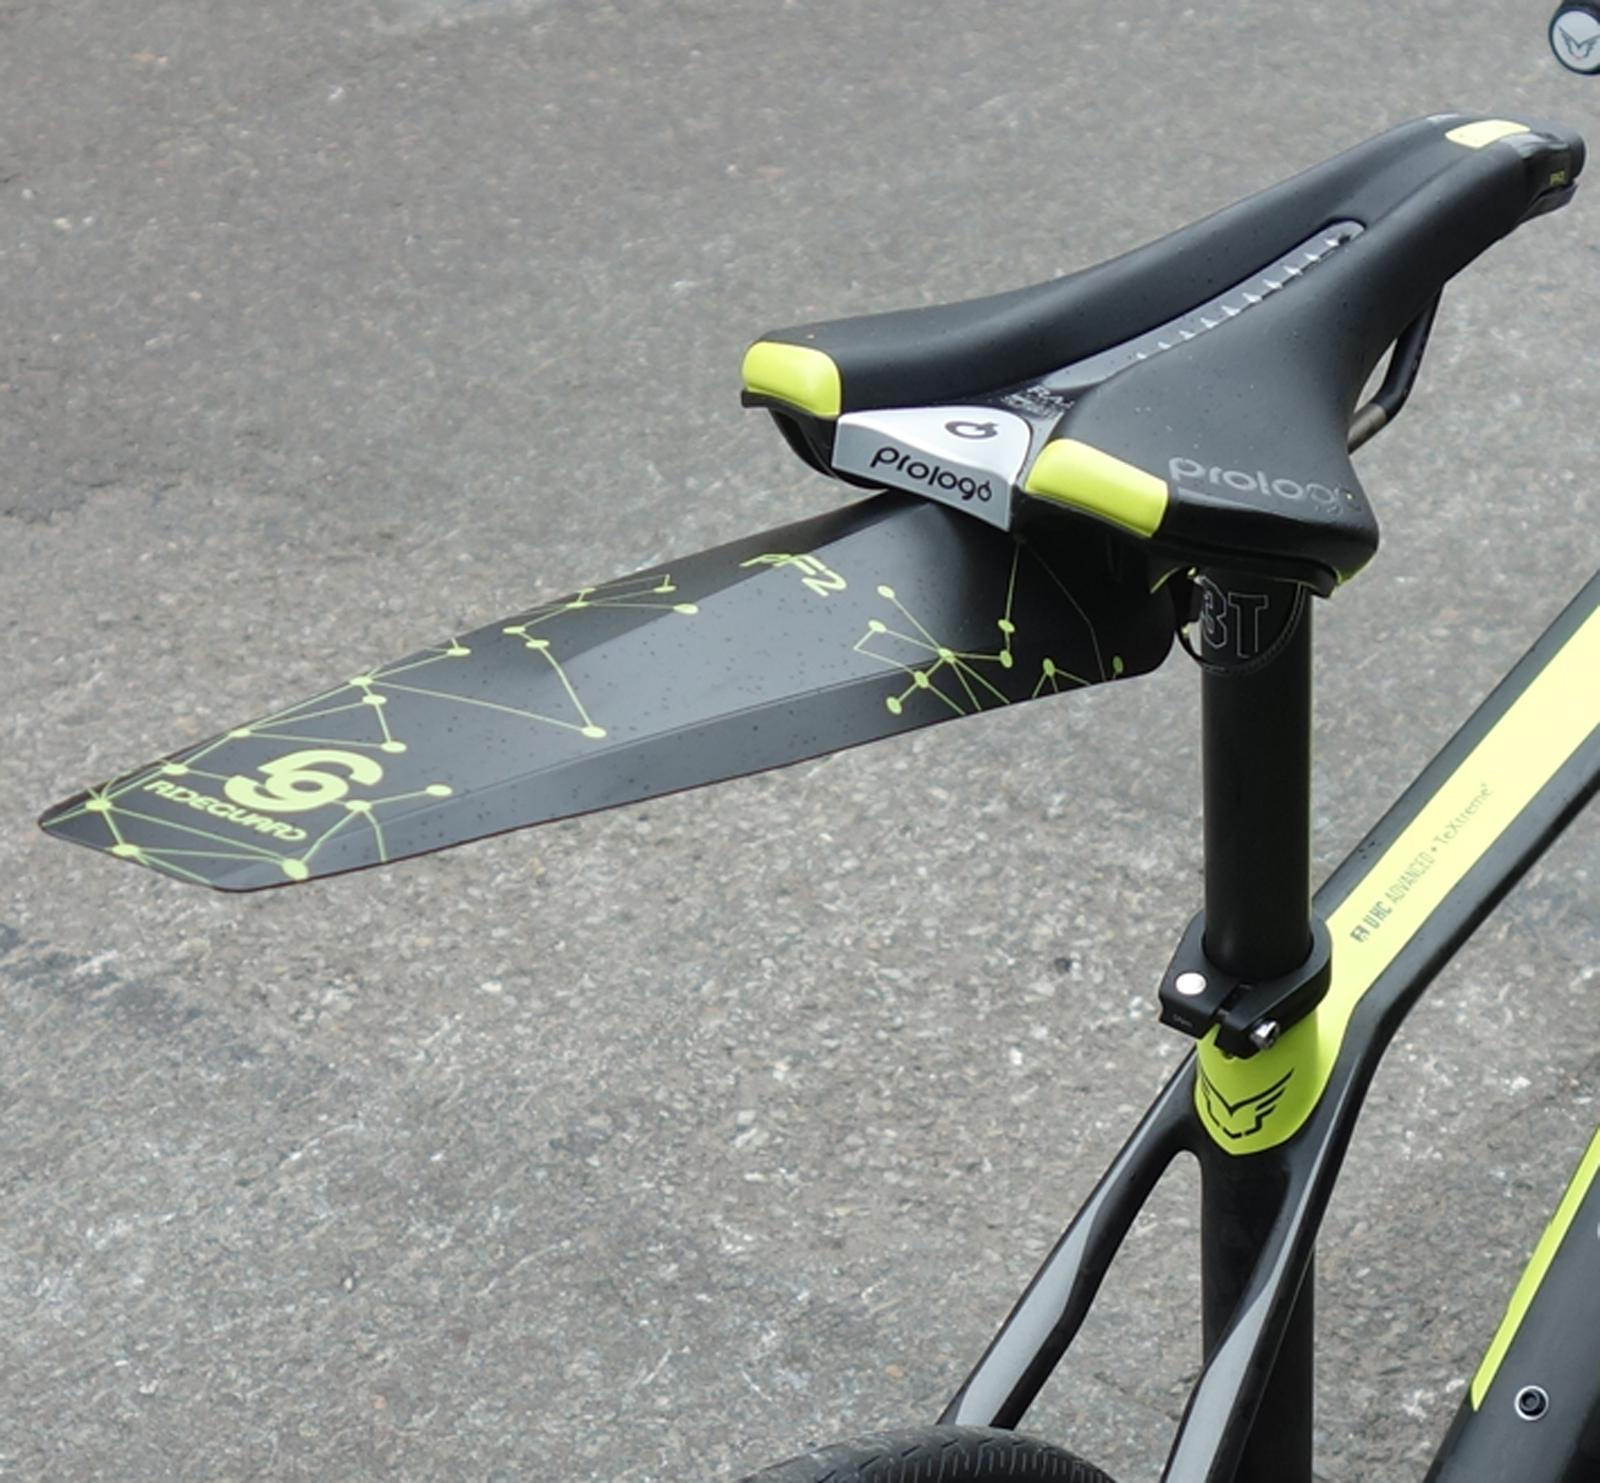 Rideguard Pf2 Mountain Bike Rear Fender Blockbuster Ass Guard